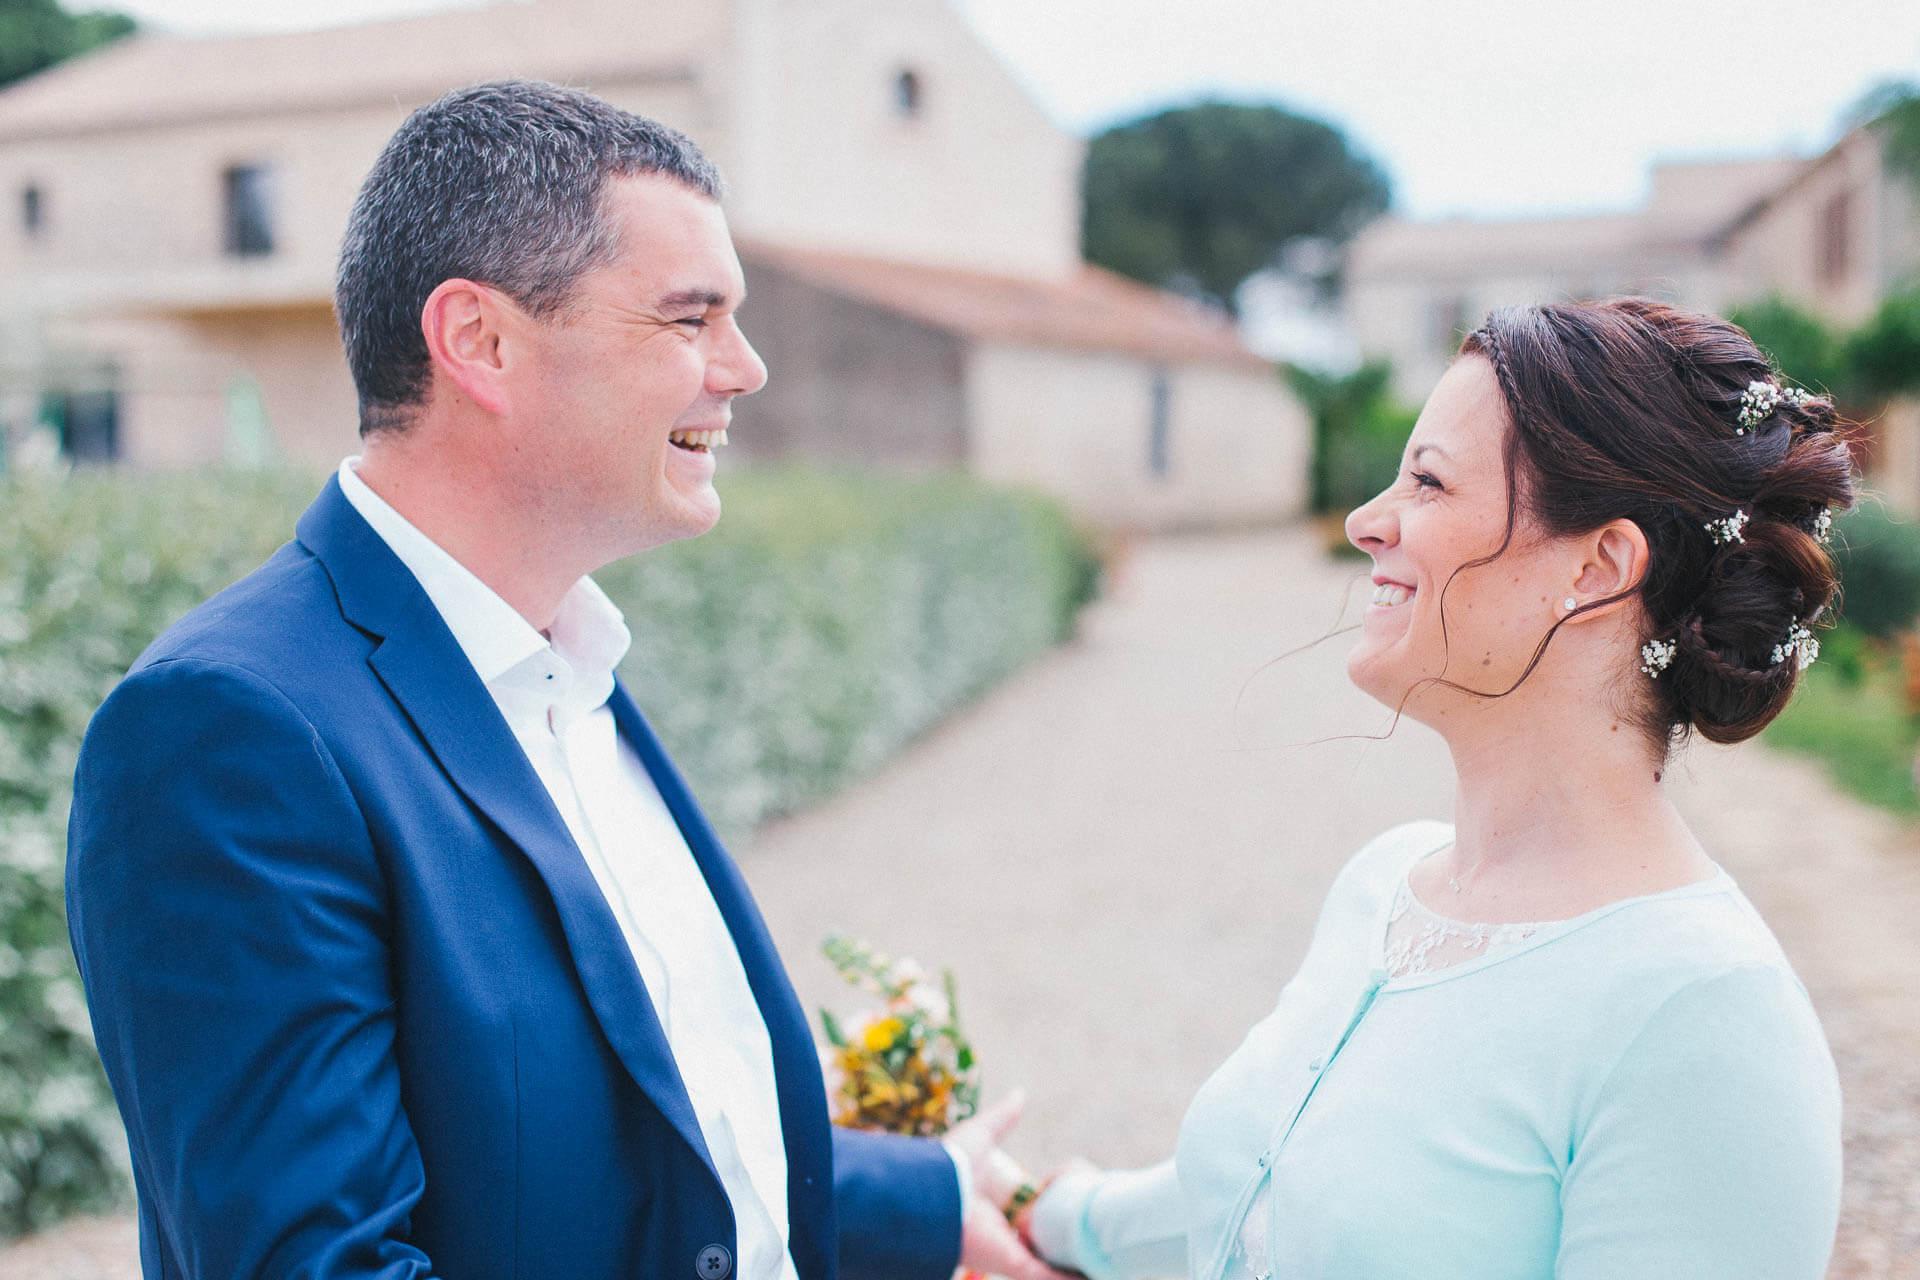 Photographe mariage montpellier champetre-10